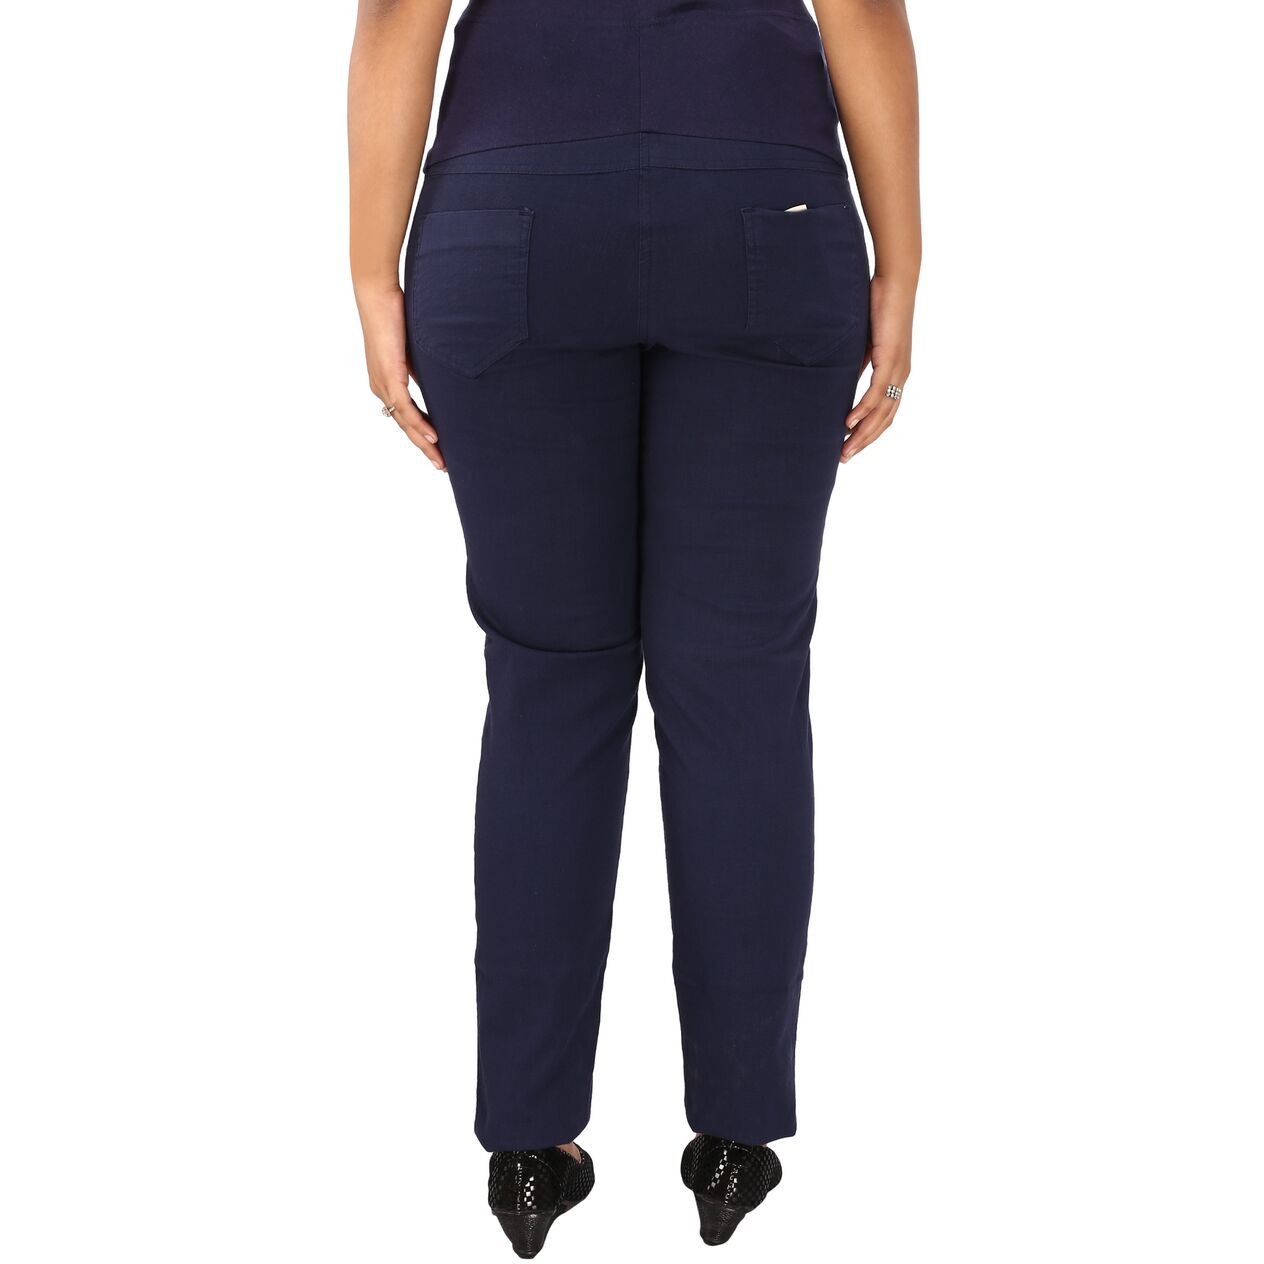 357c5bd6b5e Buy Online Mamma s maternity Women s Navy Blue Linen Trouser from ...